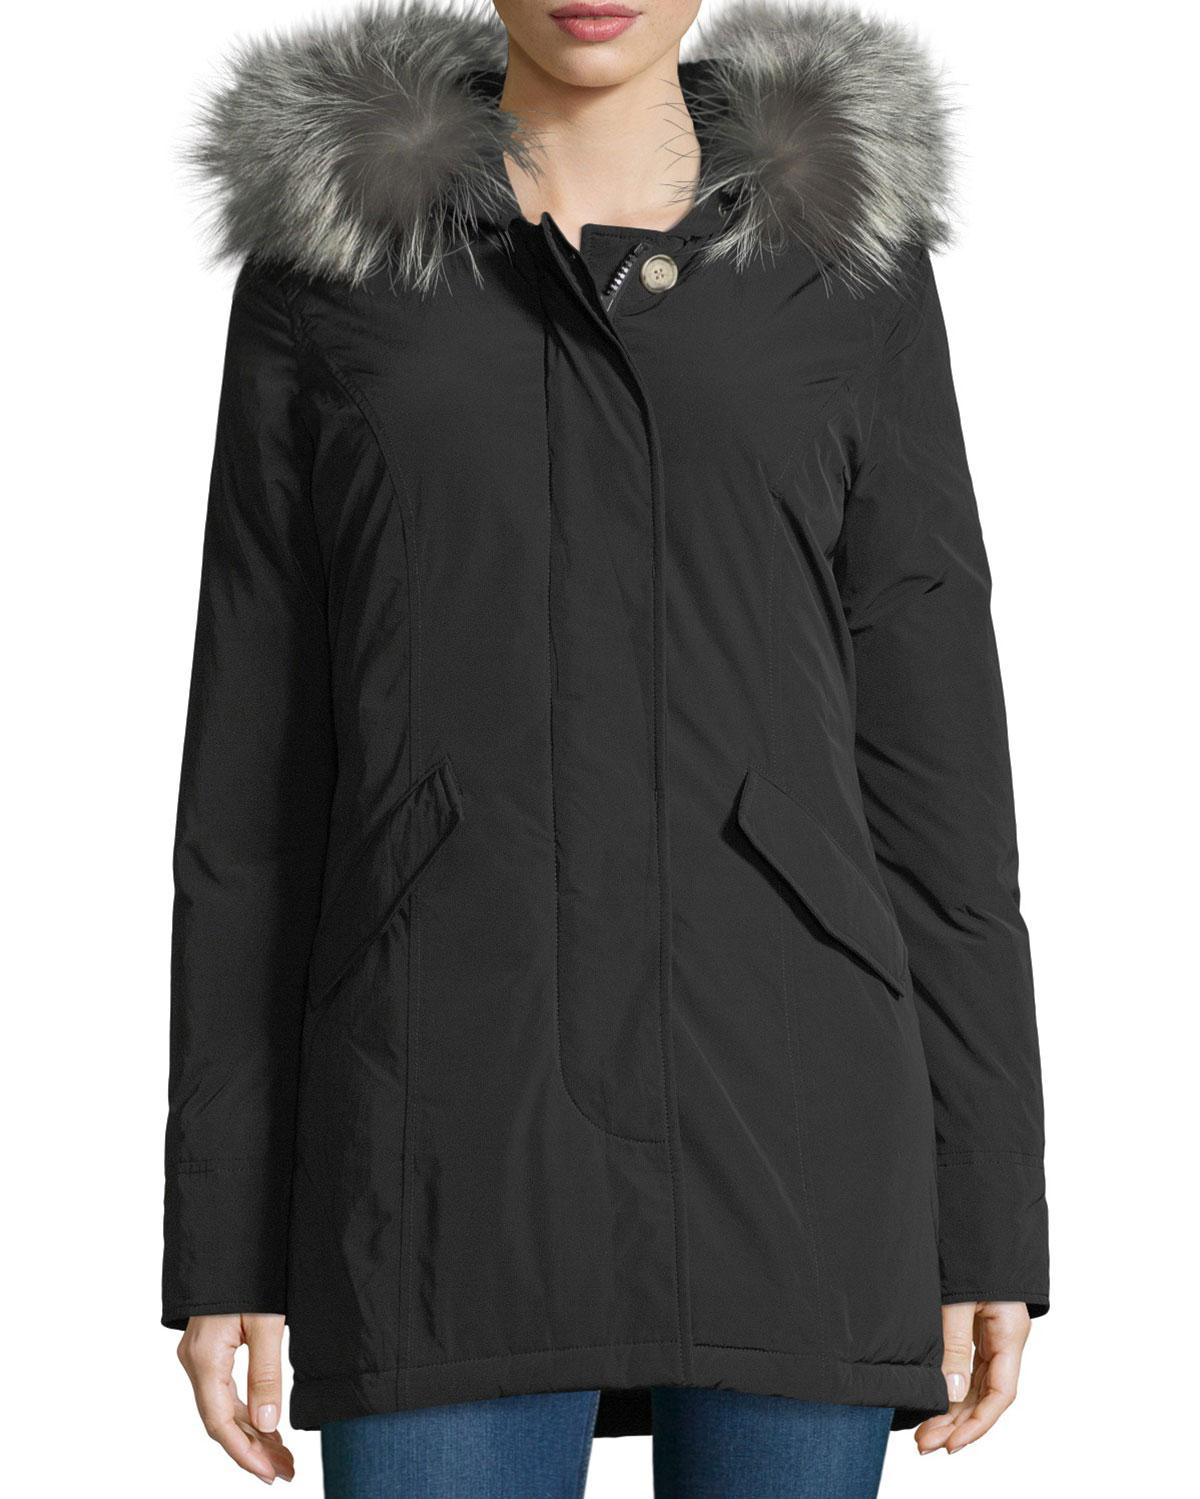 f51de5cc8f7bb Woolrich Luxury Arctic Hooded Parka Coat w  Fur